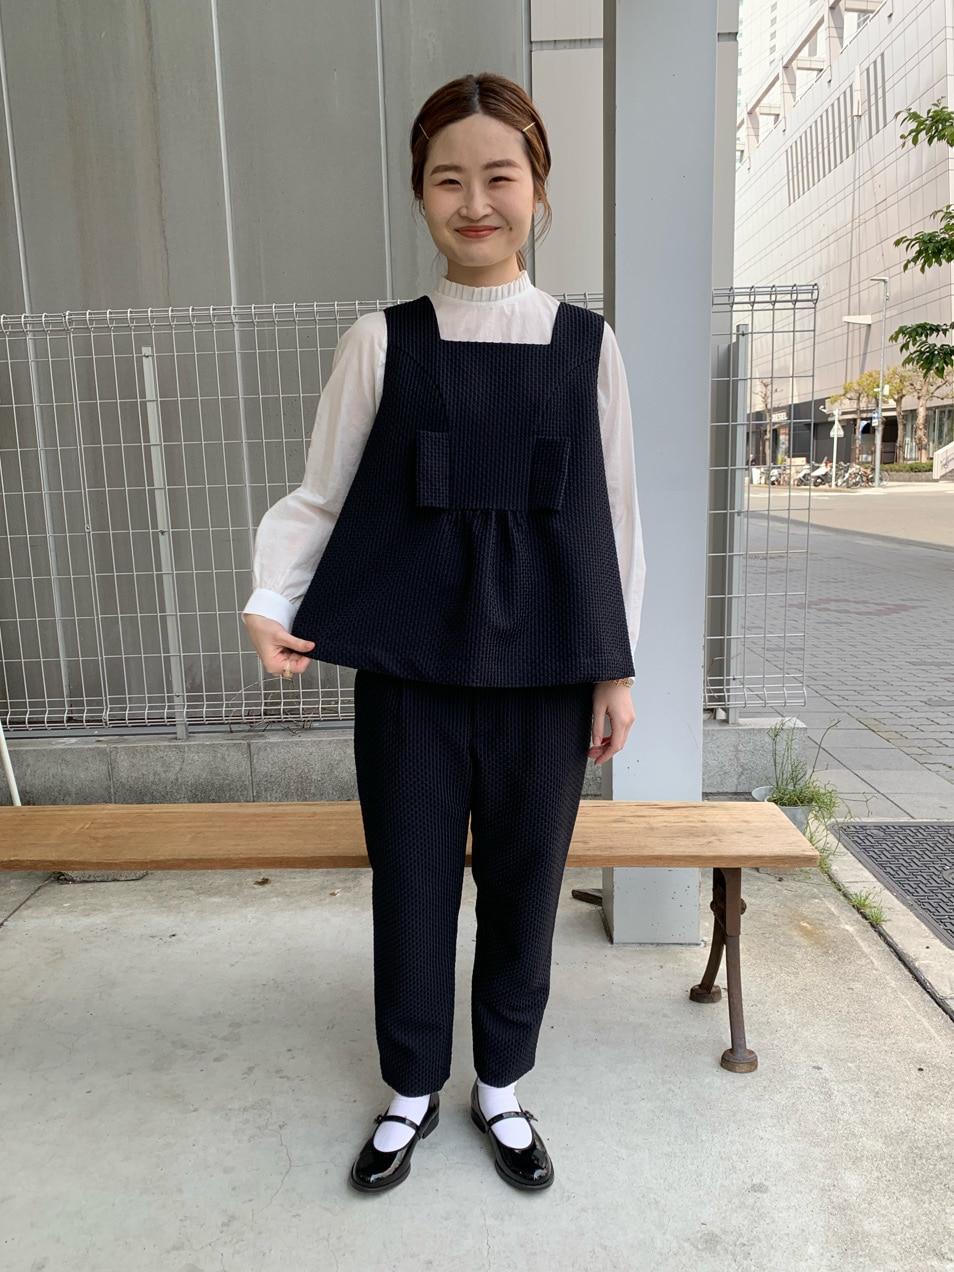 l'atelier du savon 名古屋栄路面 身長:159cm 2020.05.01